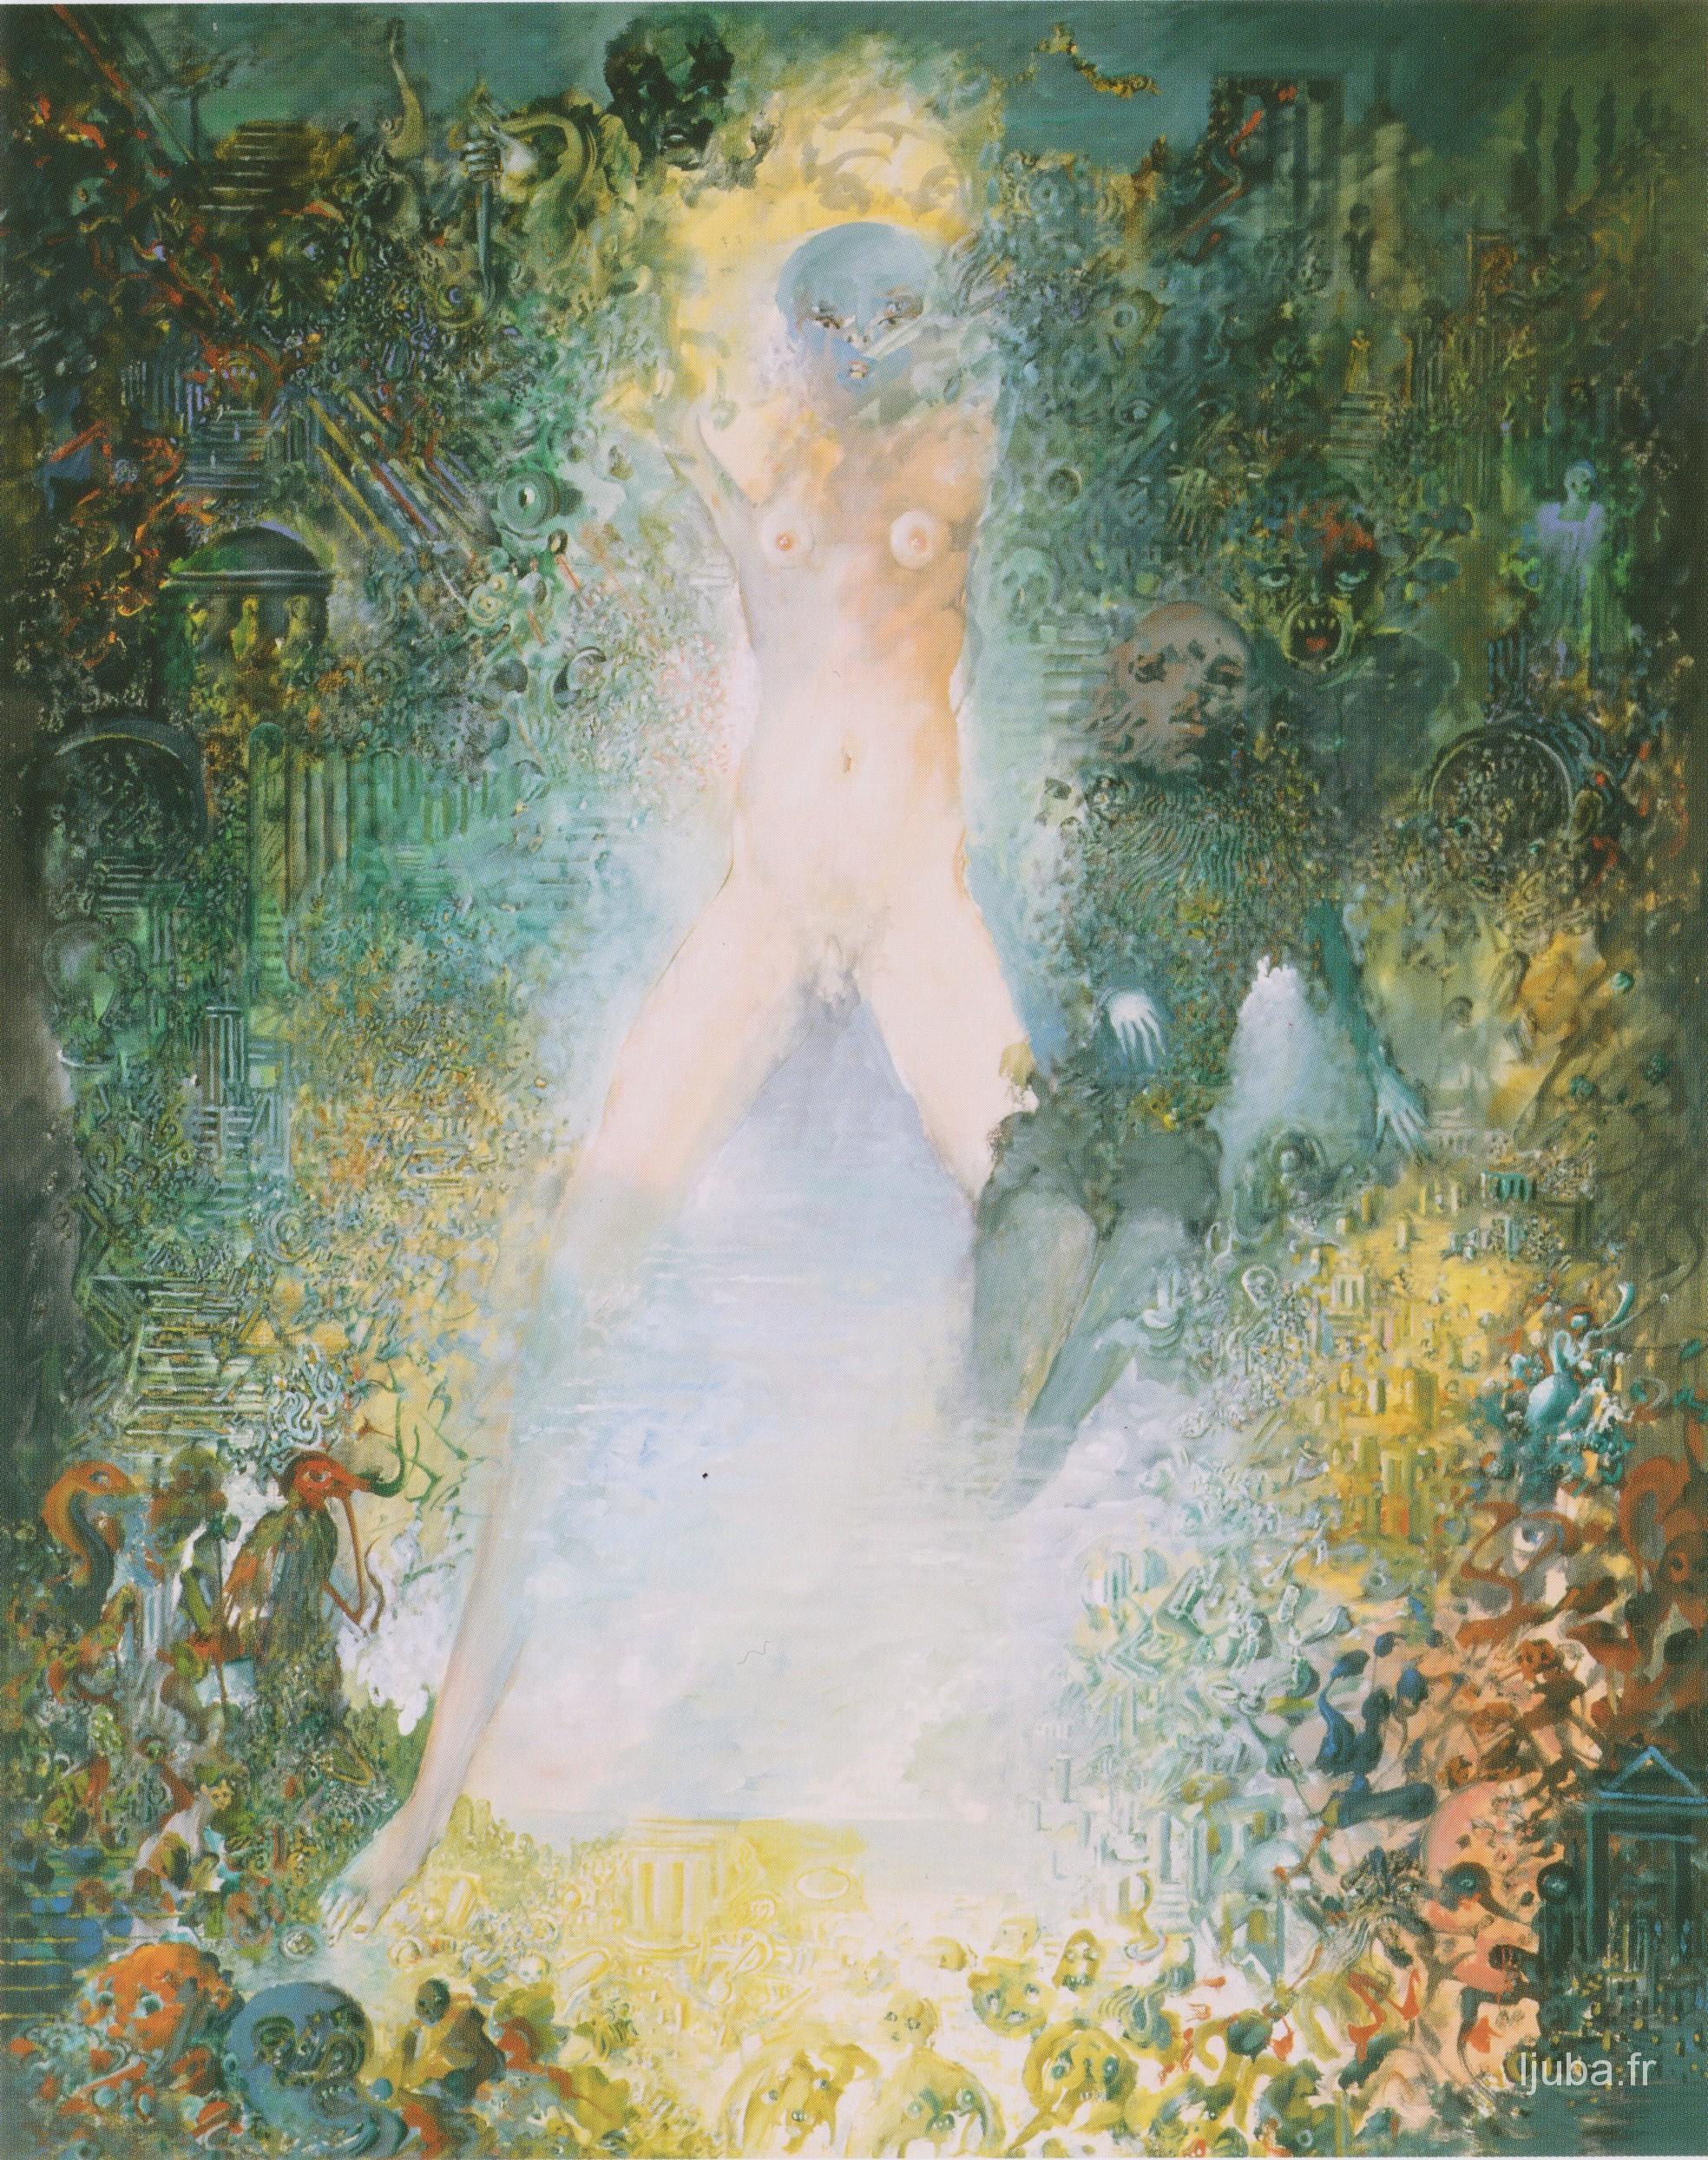 Ljuba Popovic - 2004-03, Sejšeli ili Izgubljeni raj